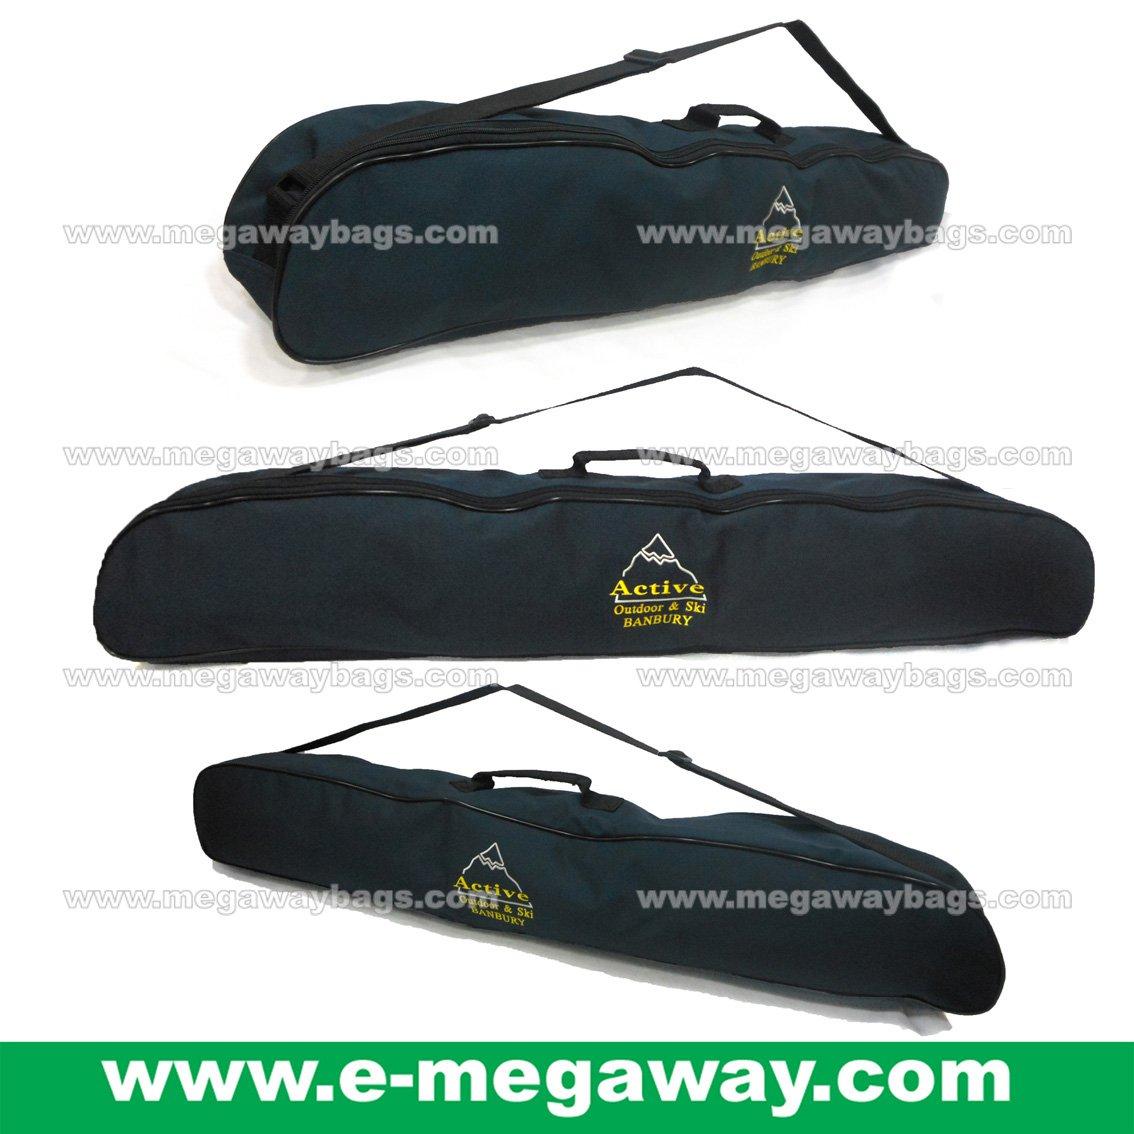 Active Hockey Floorball Skate Ski Gear Sport Kits Bag Outdoor Banbury Duffel MegawayBag #CC-0999